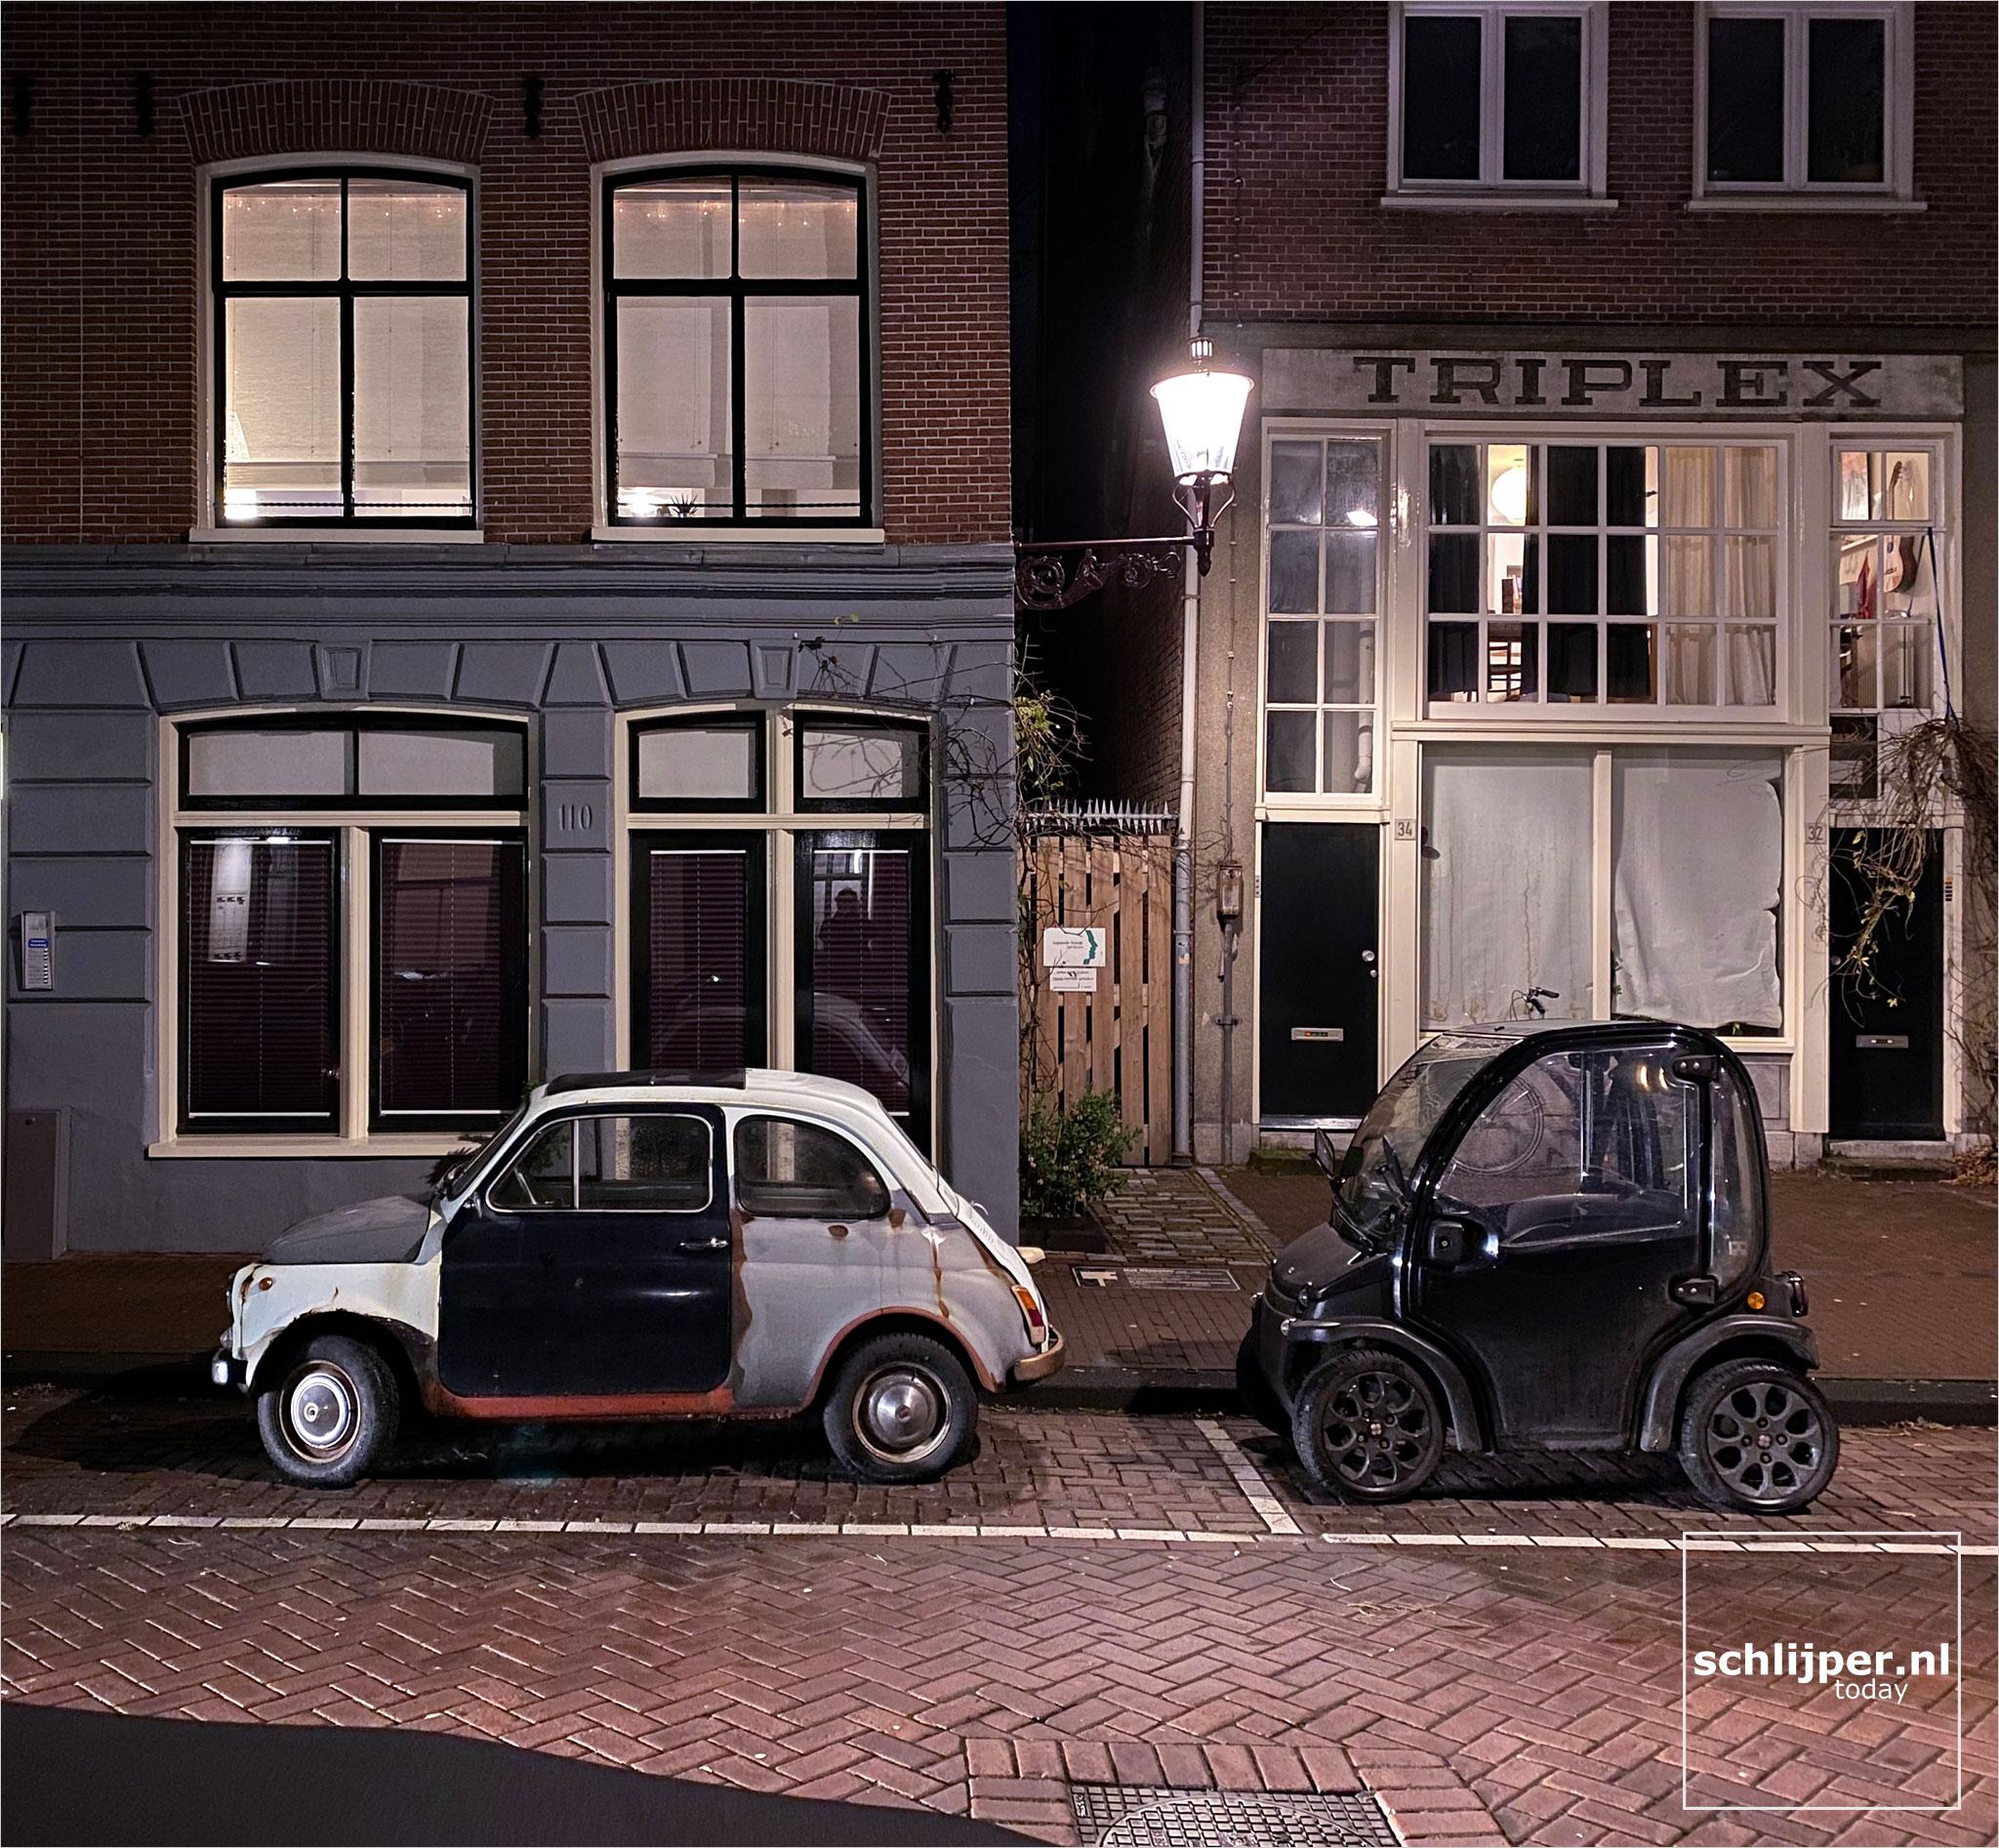 The Netherlands, Amsterdam, 17 januari 2021